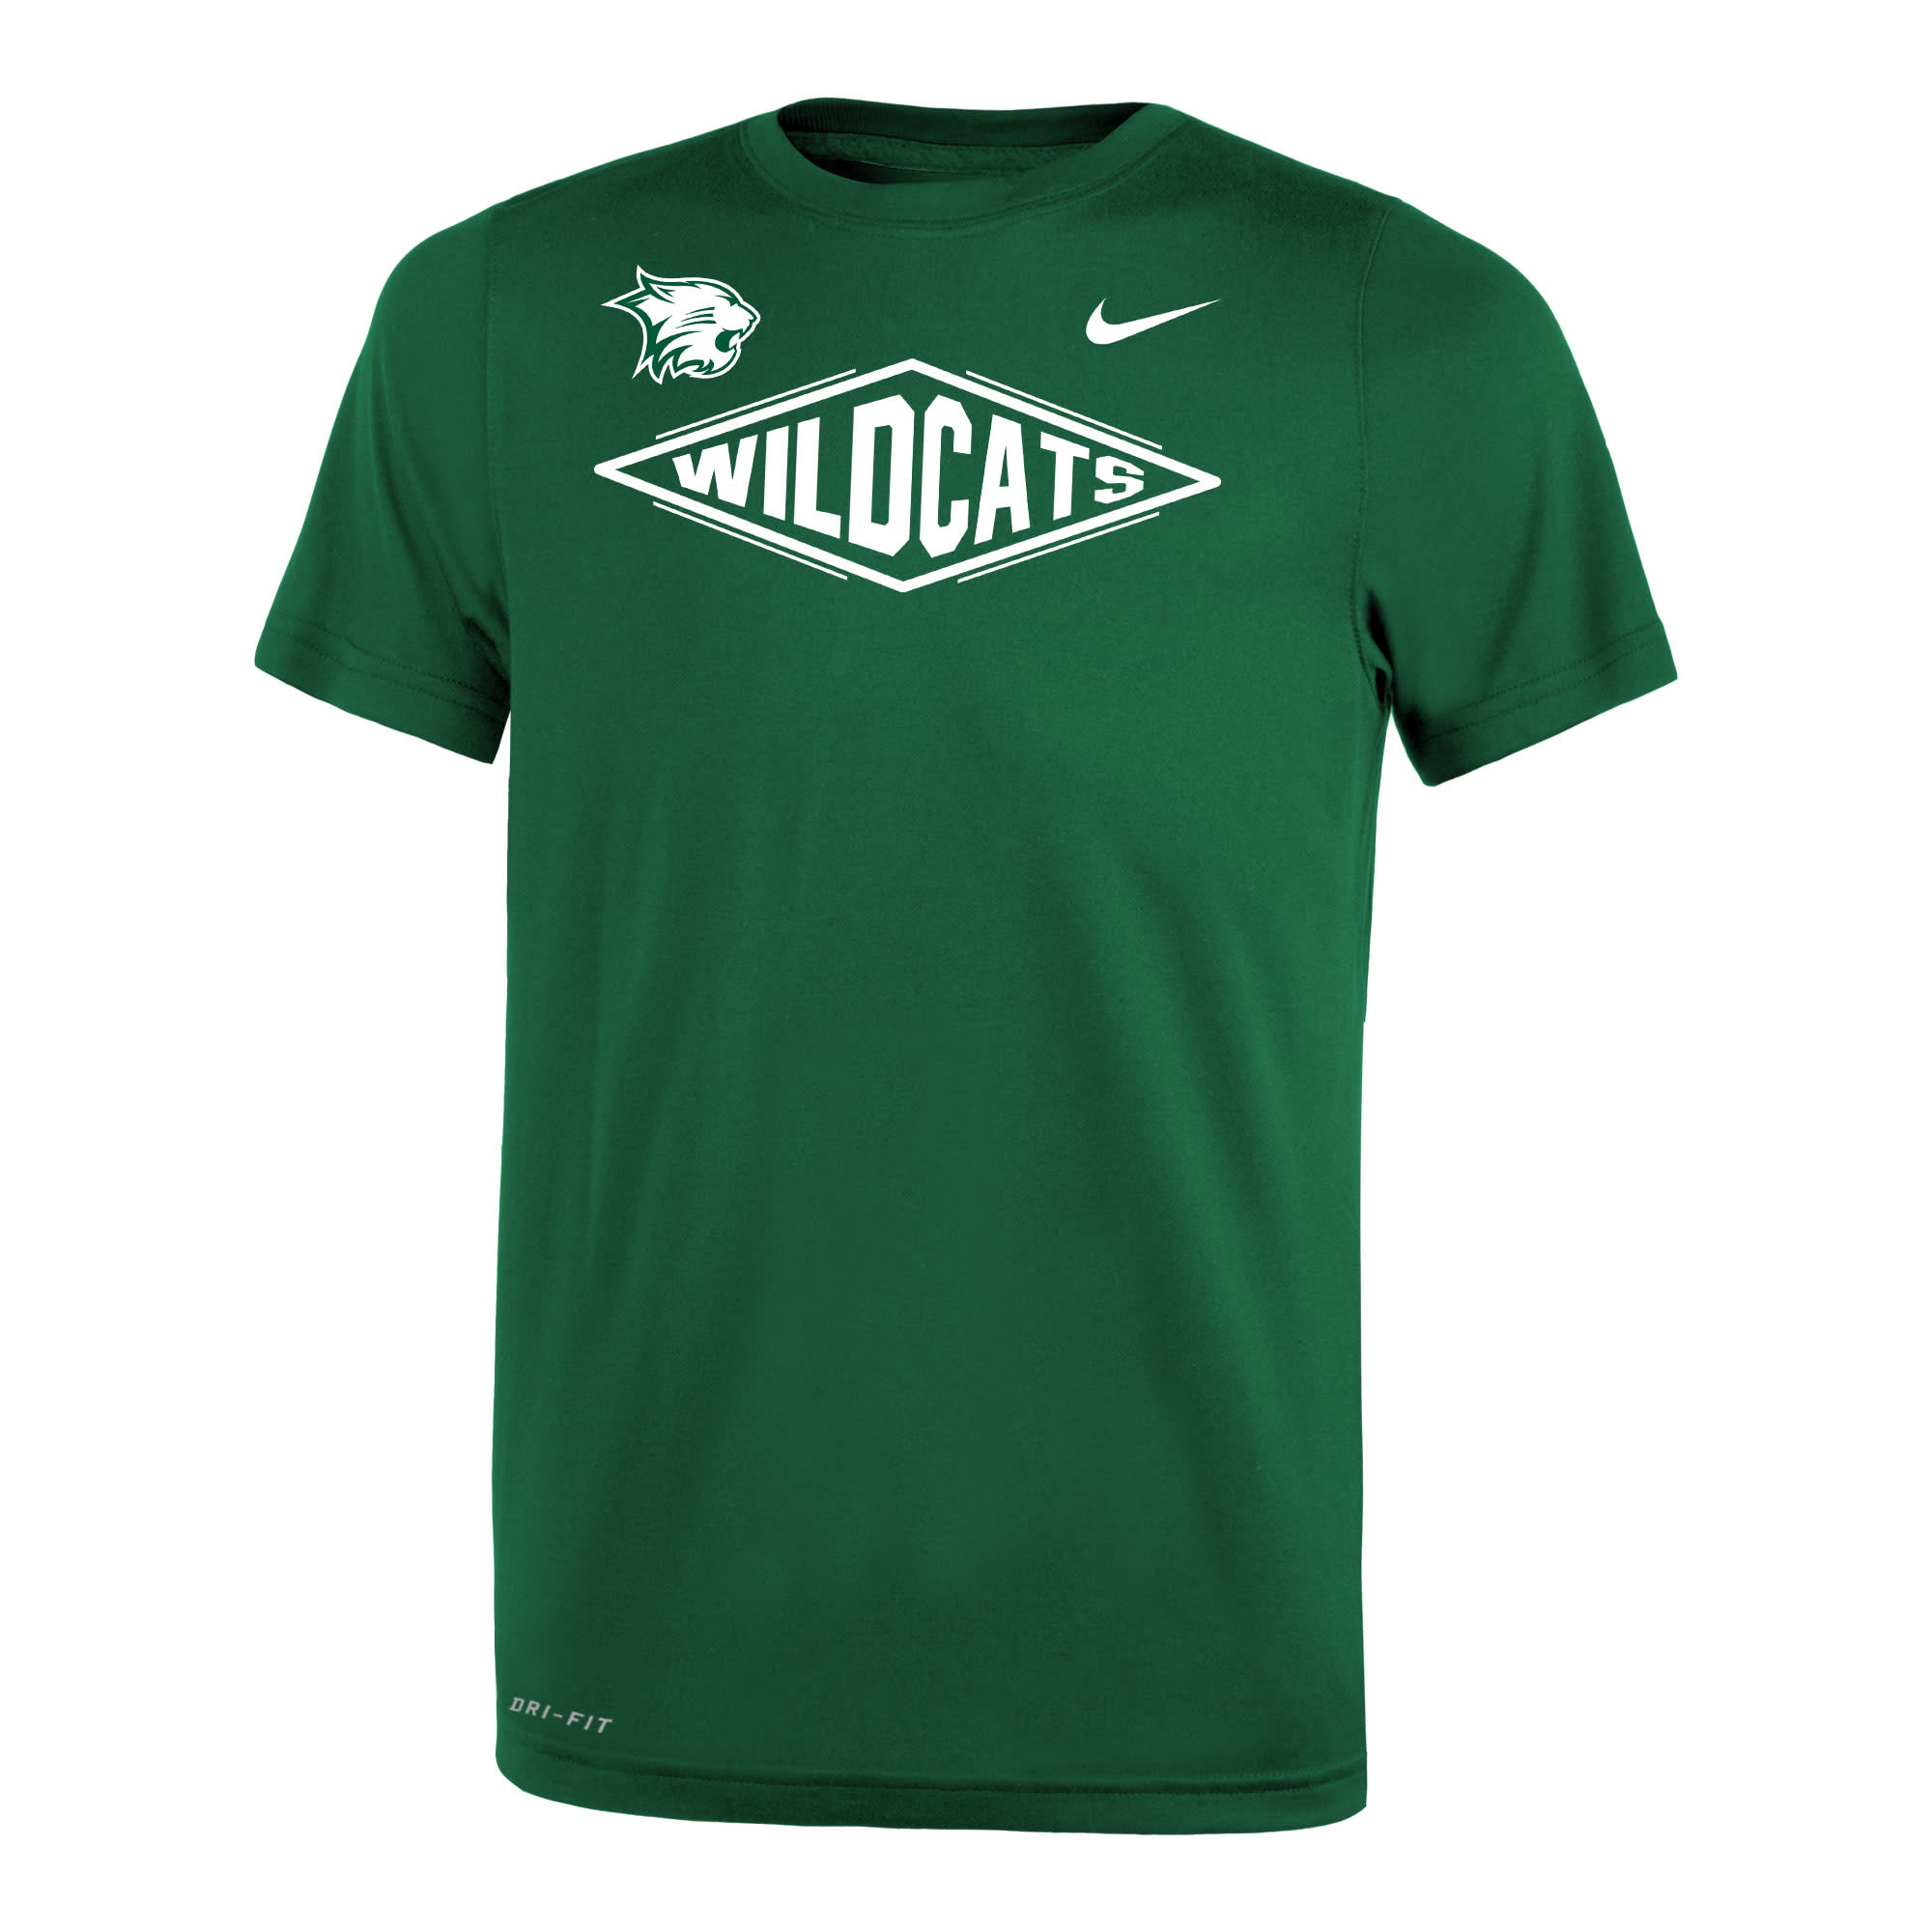 Nike T: Nike Legend SS - Green with Diamond